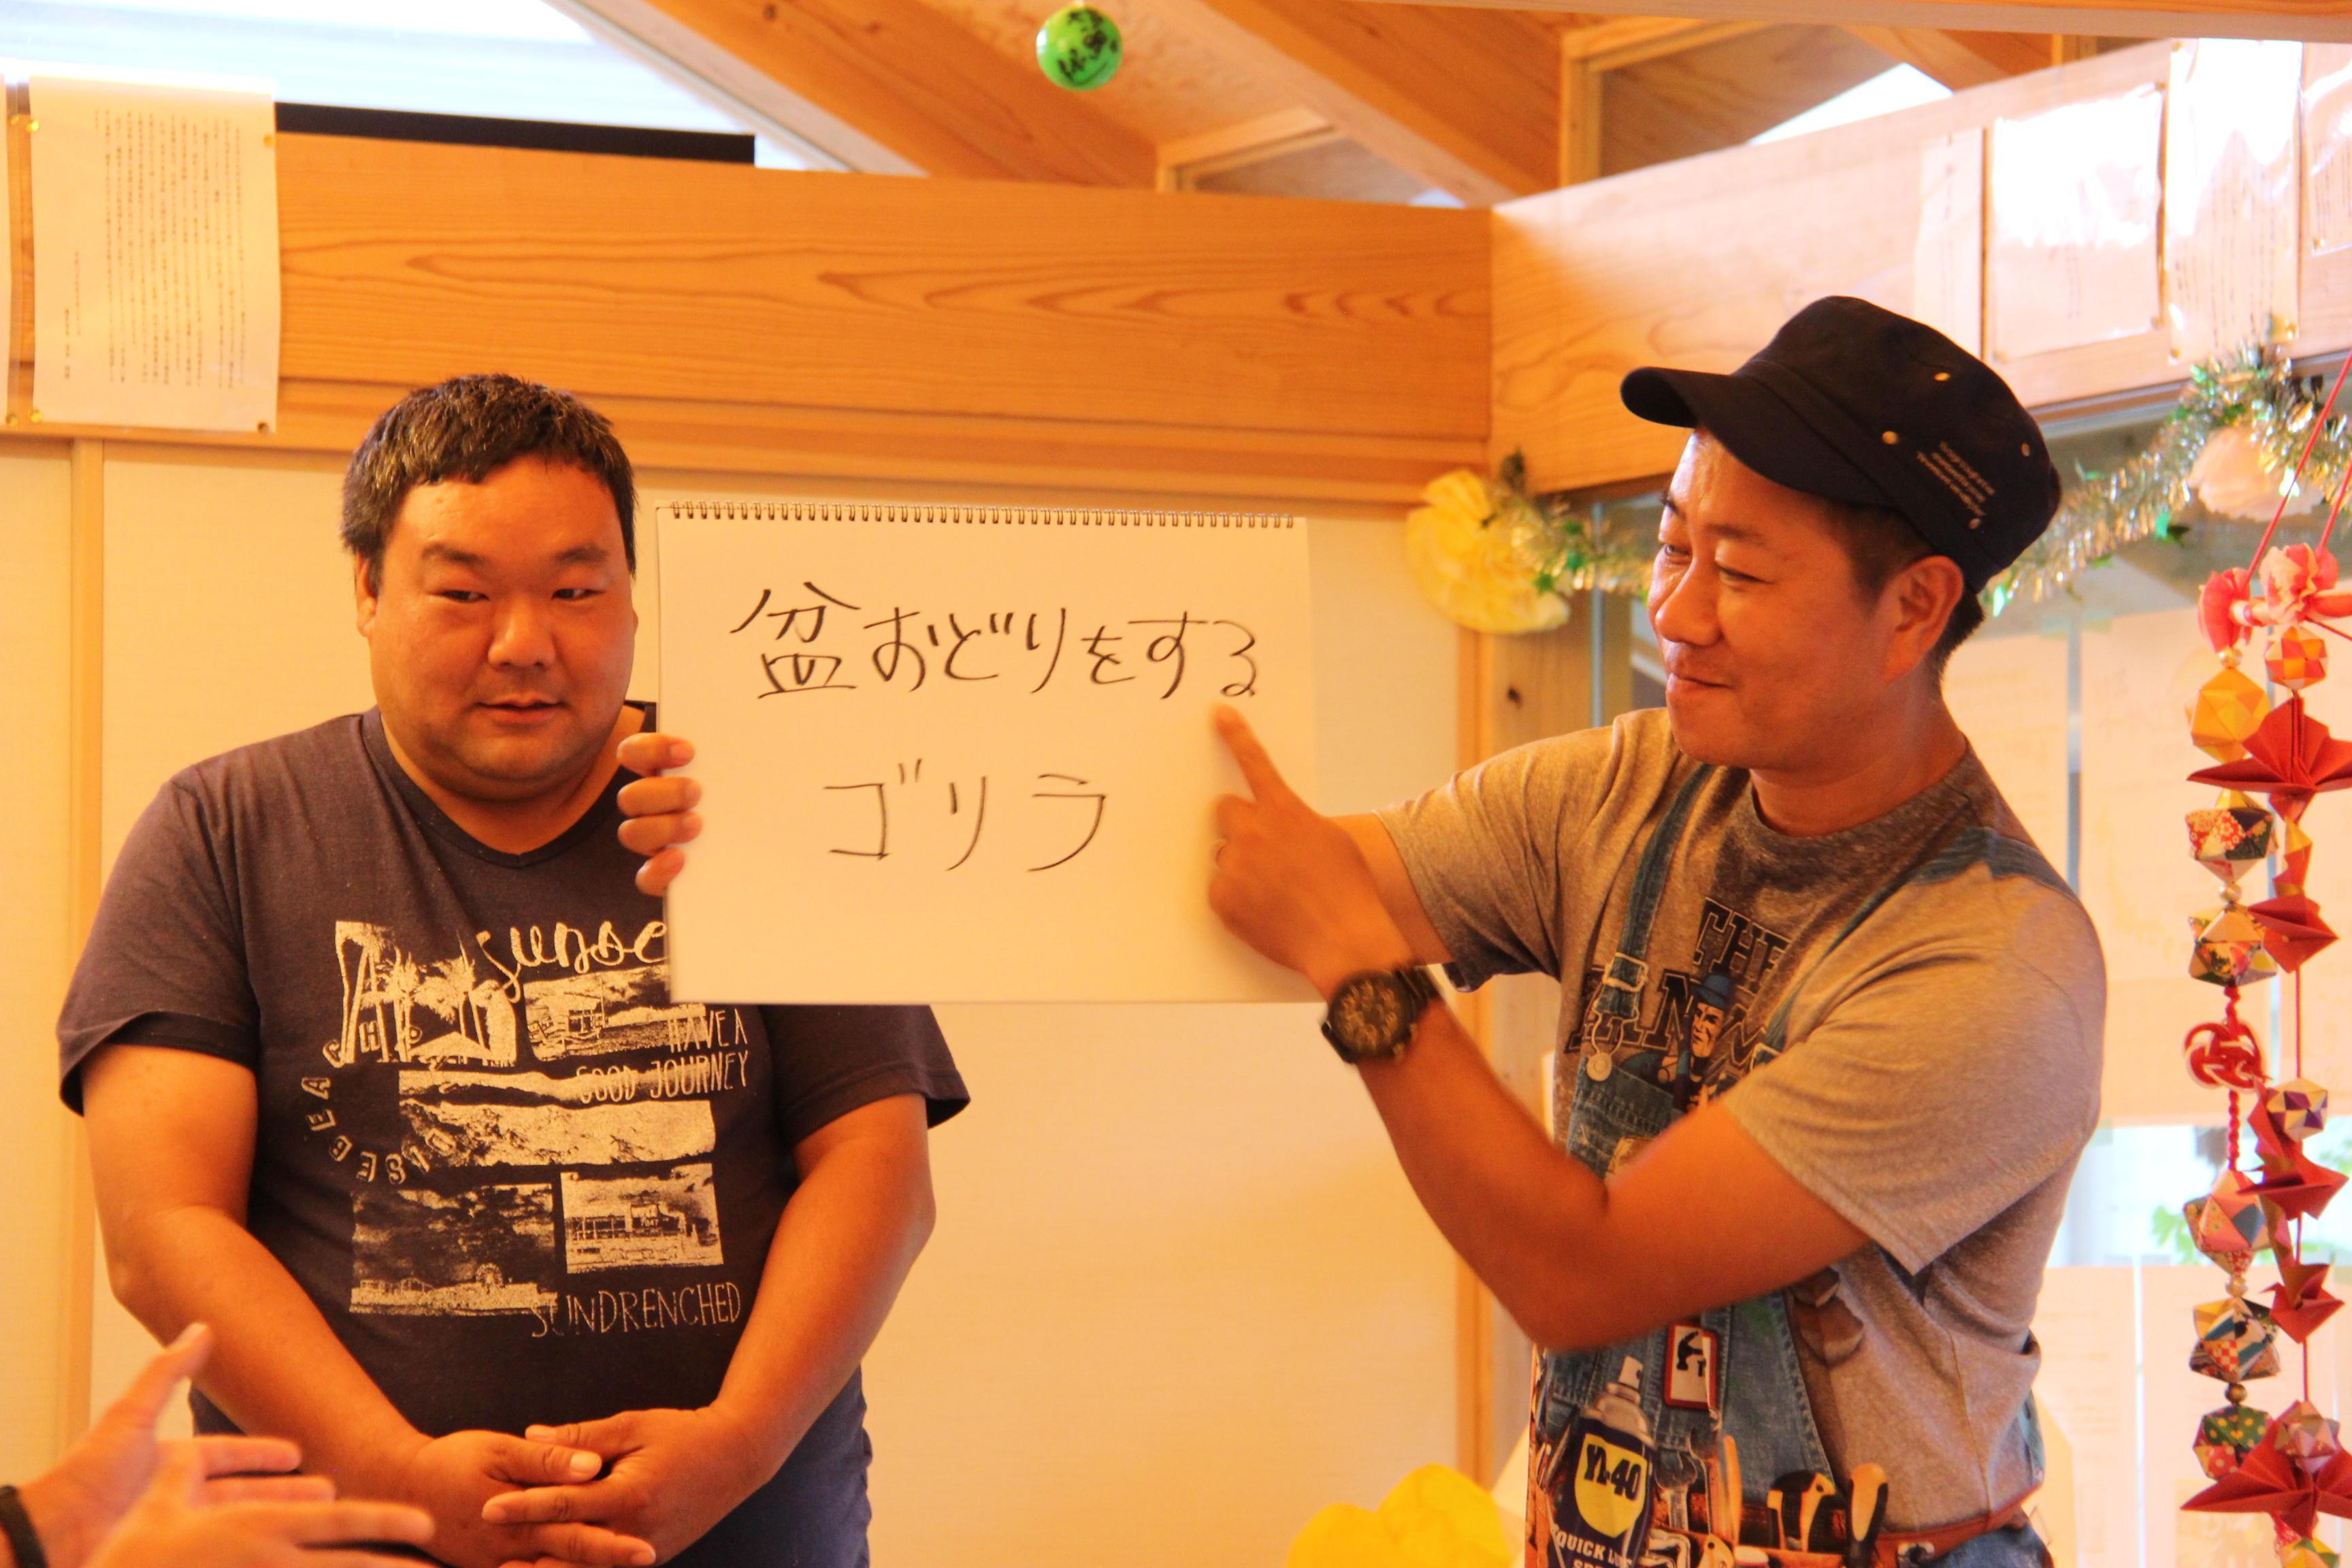 http://news.yoshimoto.co.jp/20180809123528-cce7fa40fc4fb807905887de0f56352b554acaee.jpg